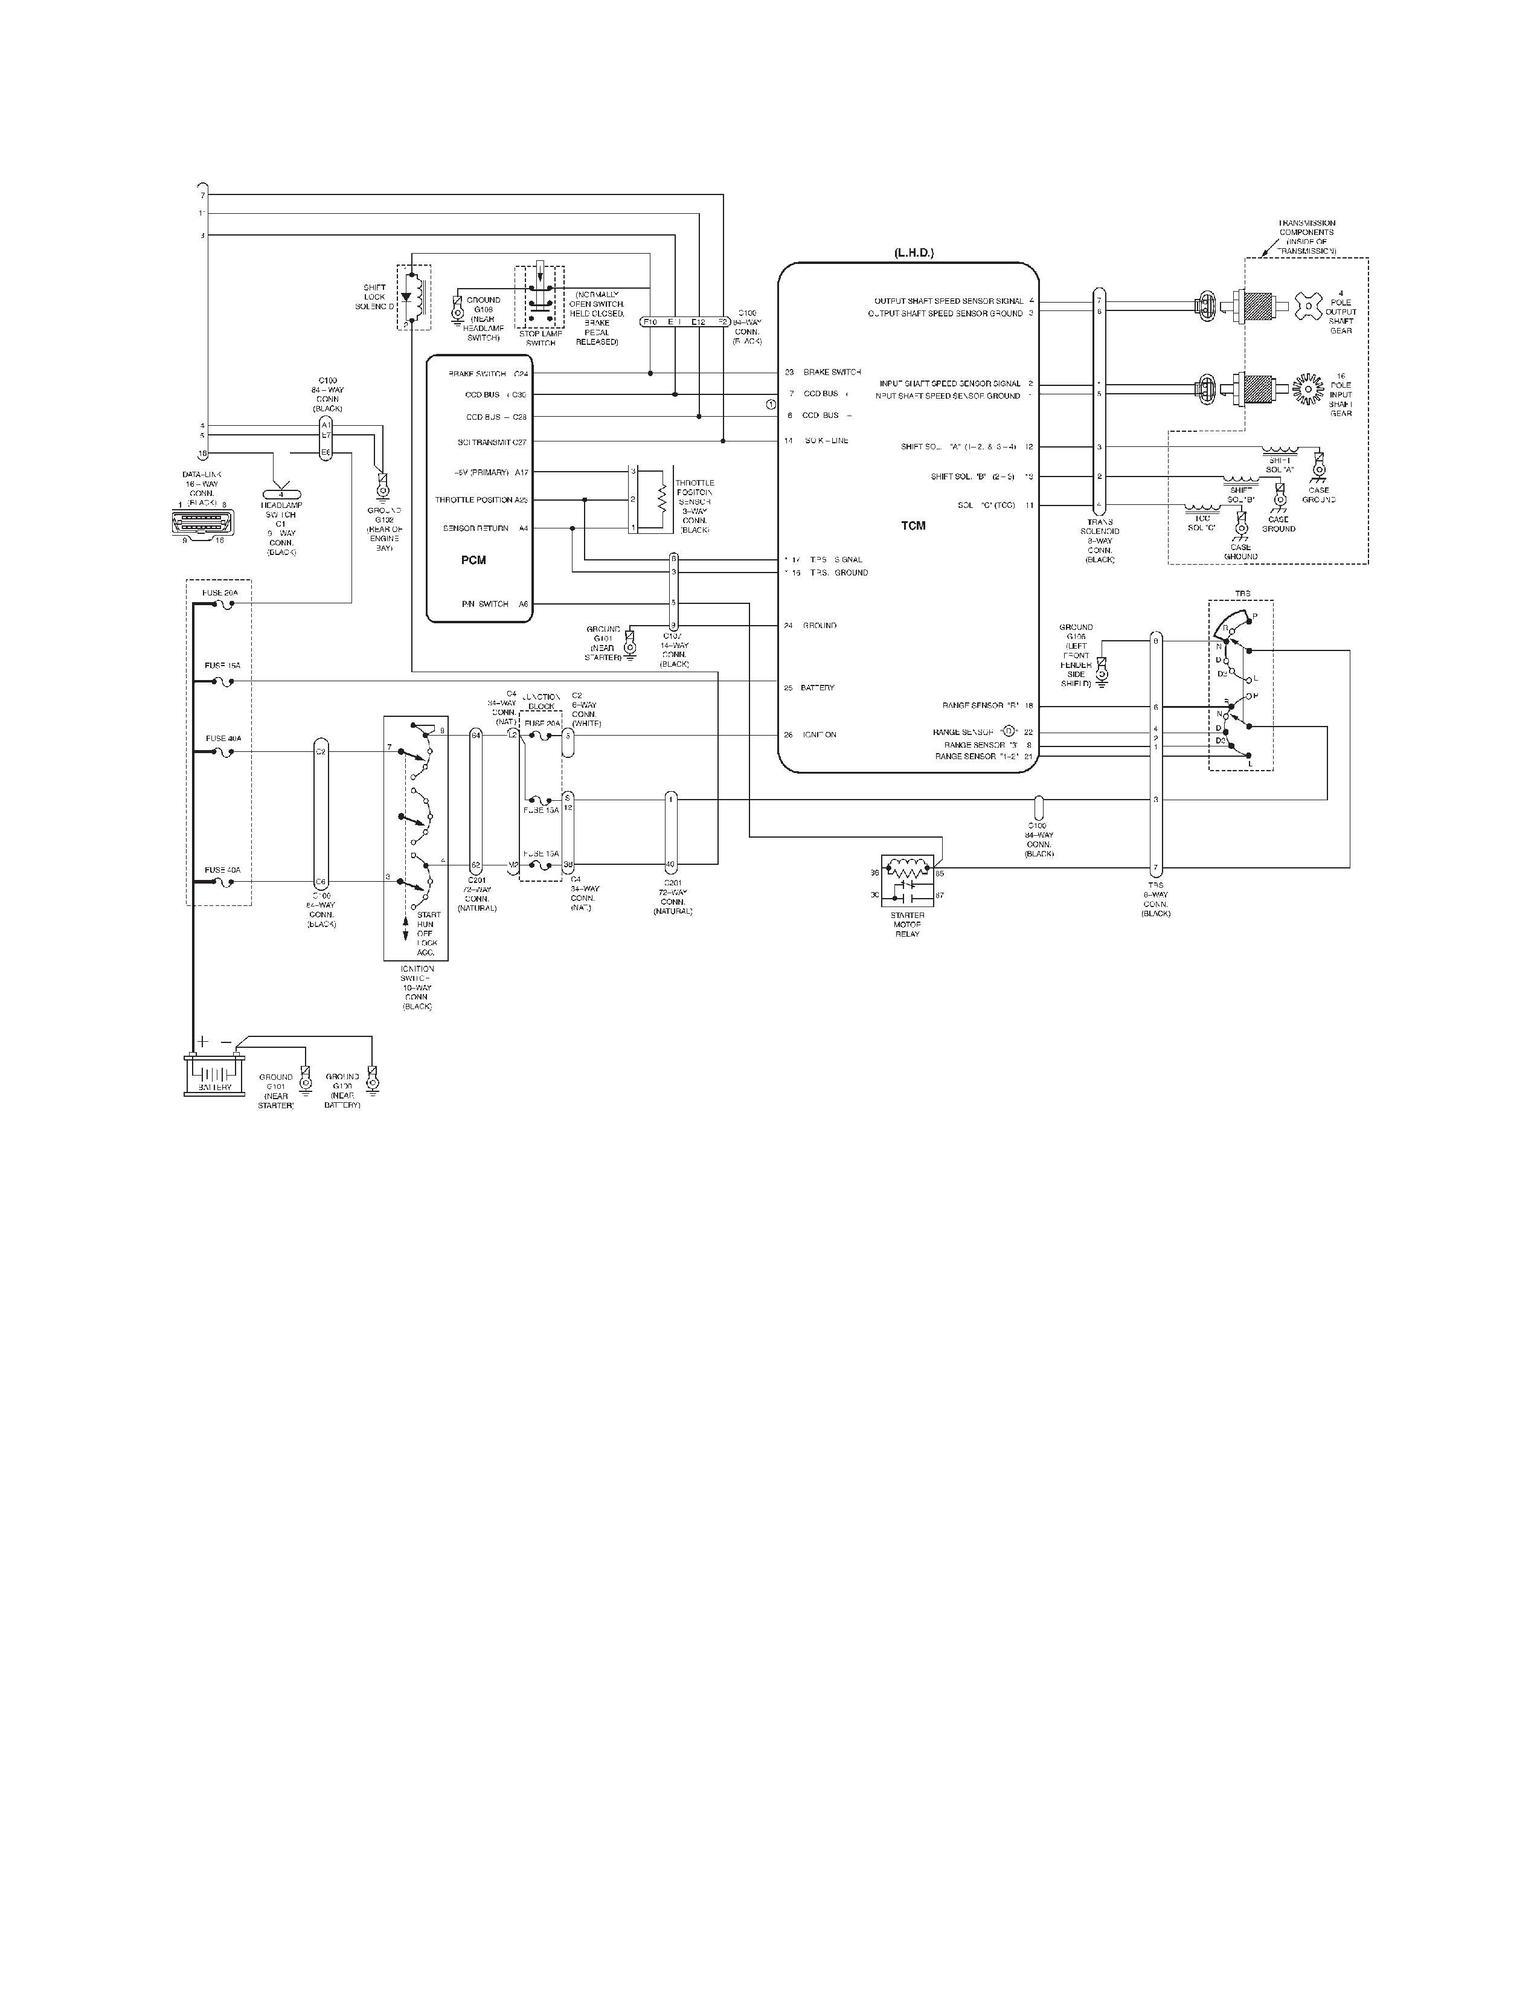 Aw4 tcm wiring diagram free 2000 jeep wrangler tj wiring